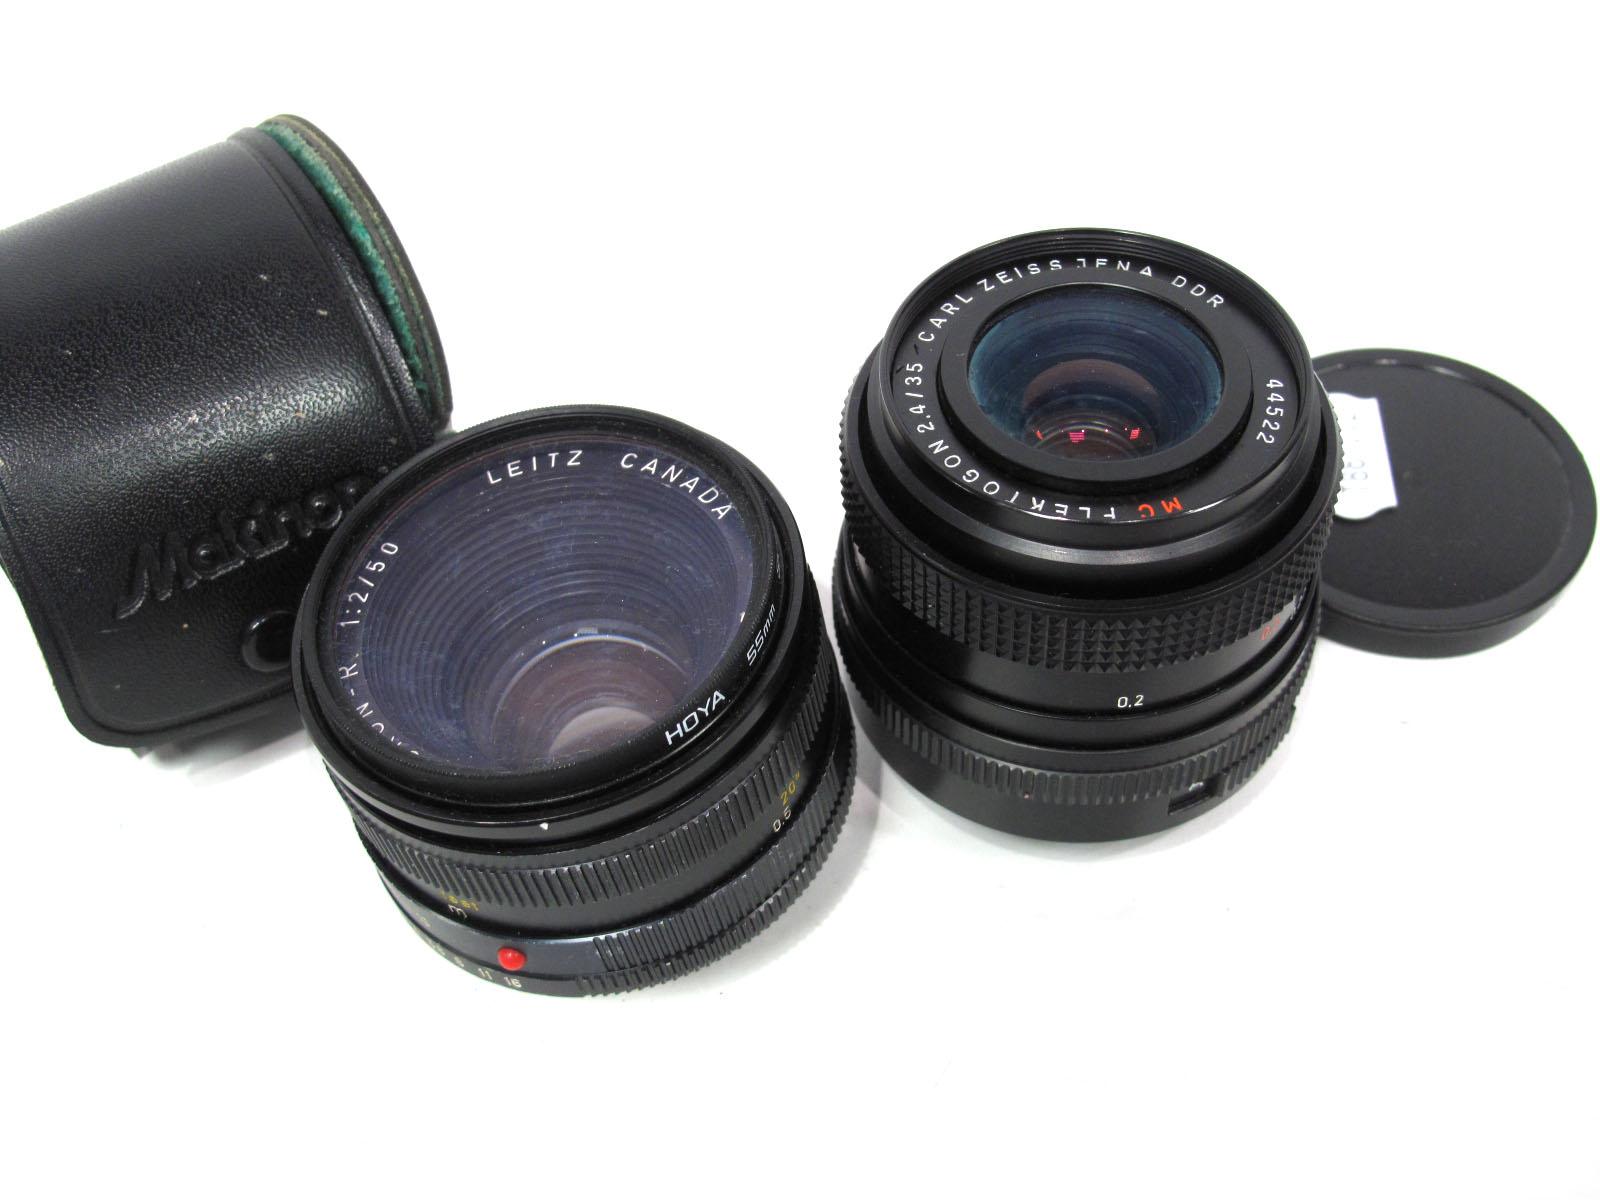 Carl Zeiss Jena DDR Flektogon 2.4/35, Leitz Summicron - R 1.2/50 lens in case. (2)